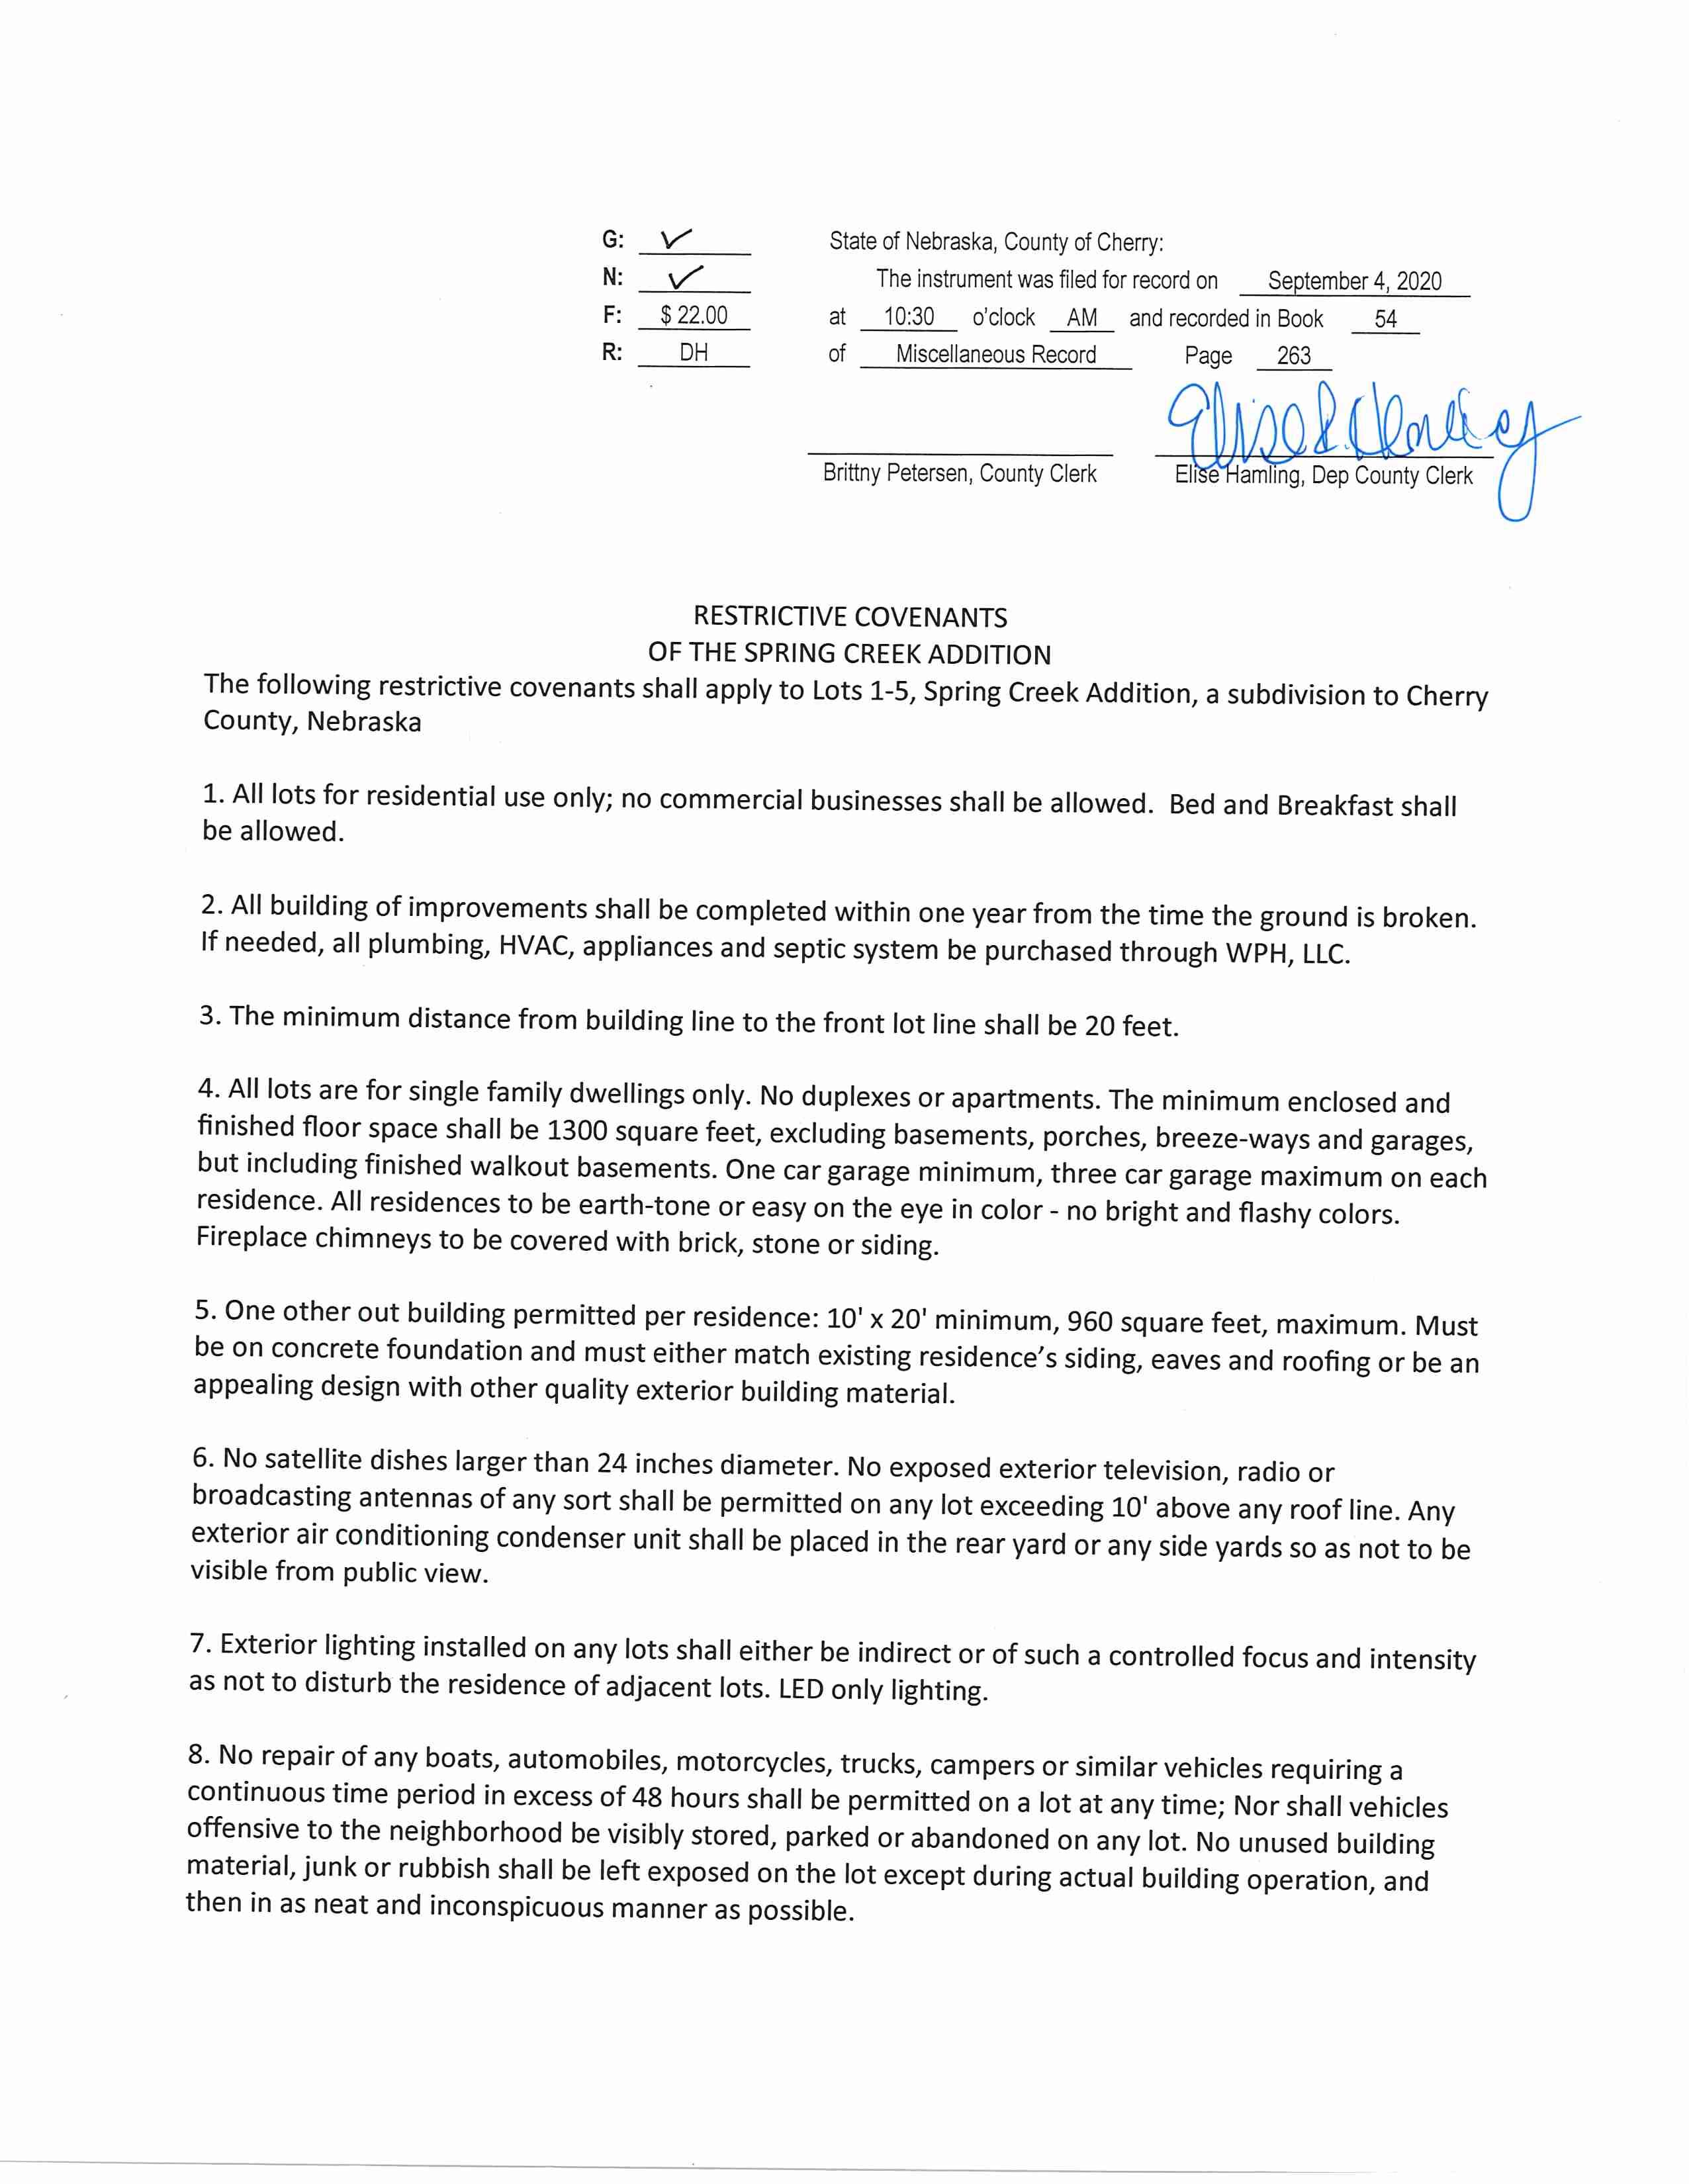 SpringCreek Covenants Sealed Copy_Page_1